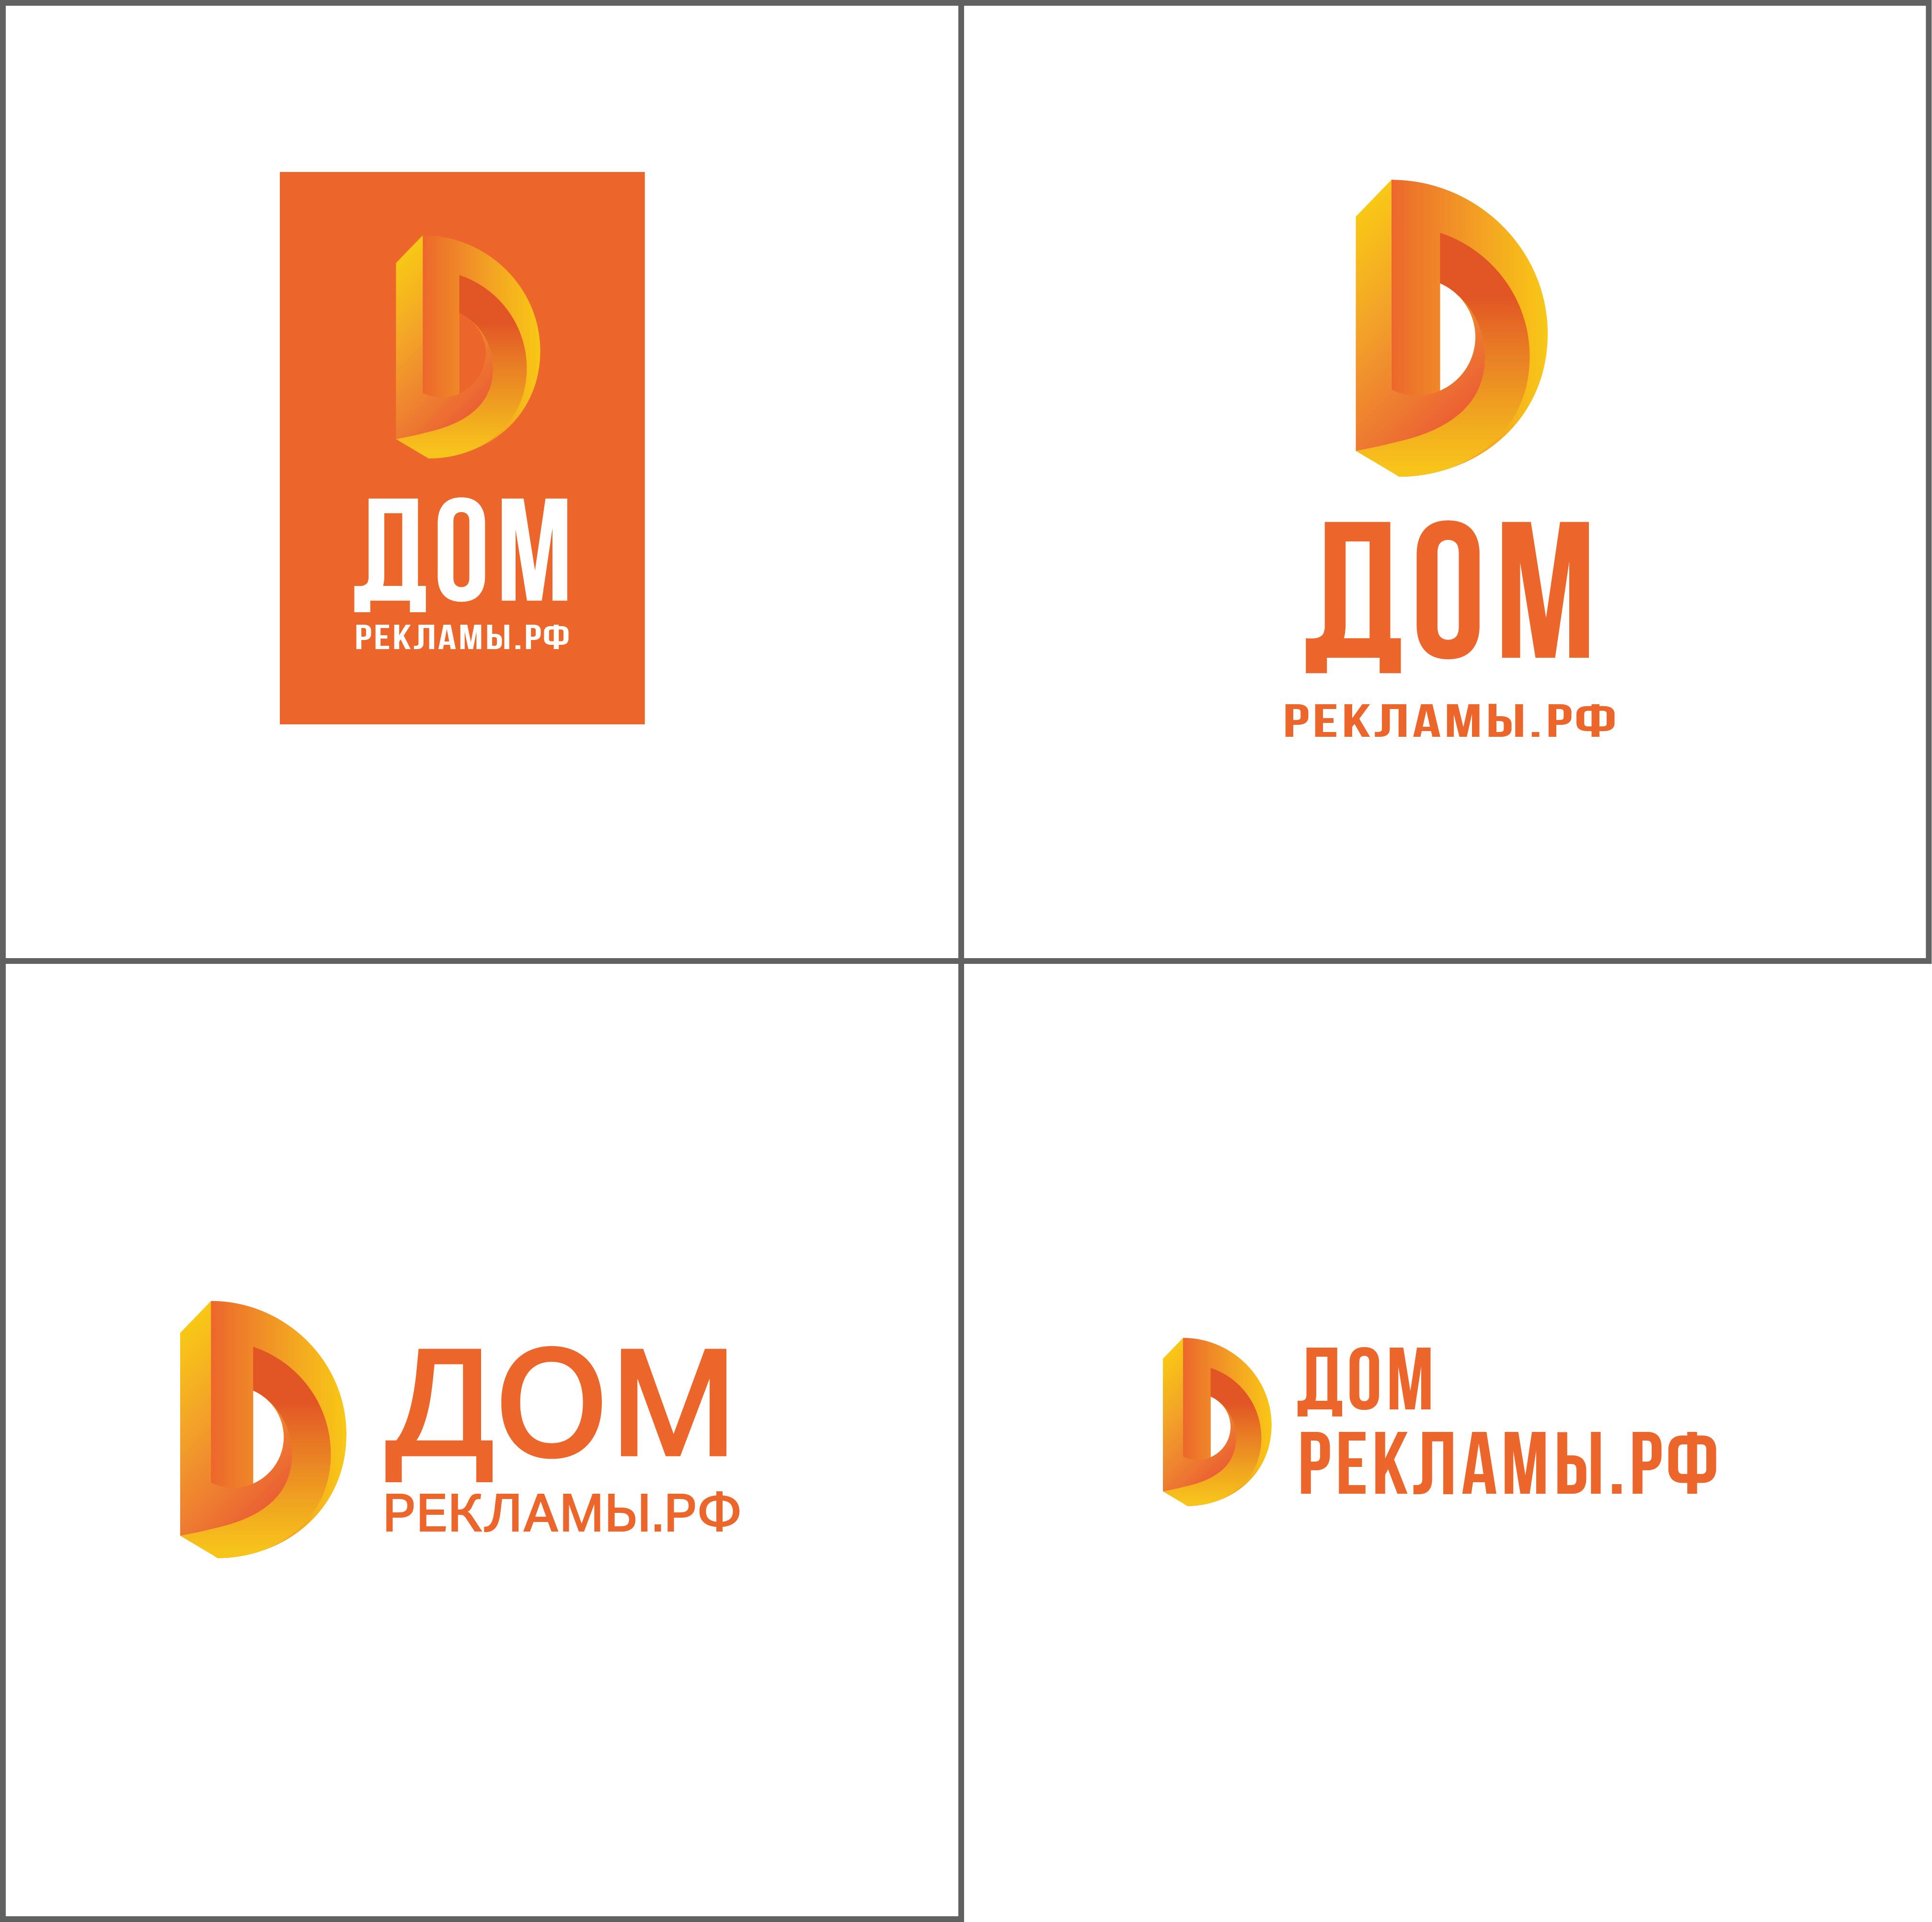 Дизайн логотипа рекламно-производственной компании фото f_4415edcf3cb26b81.jpg